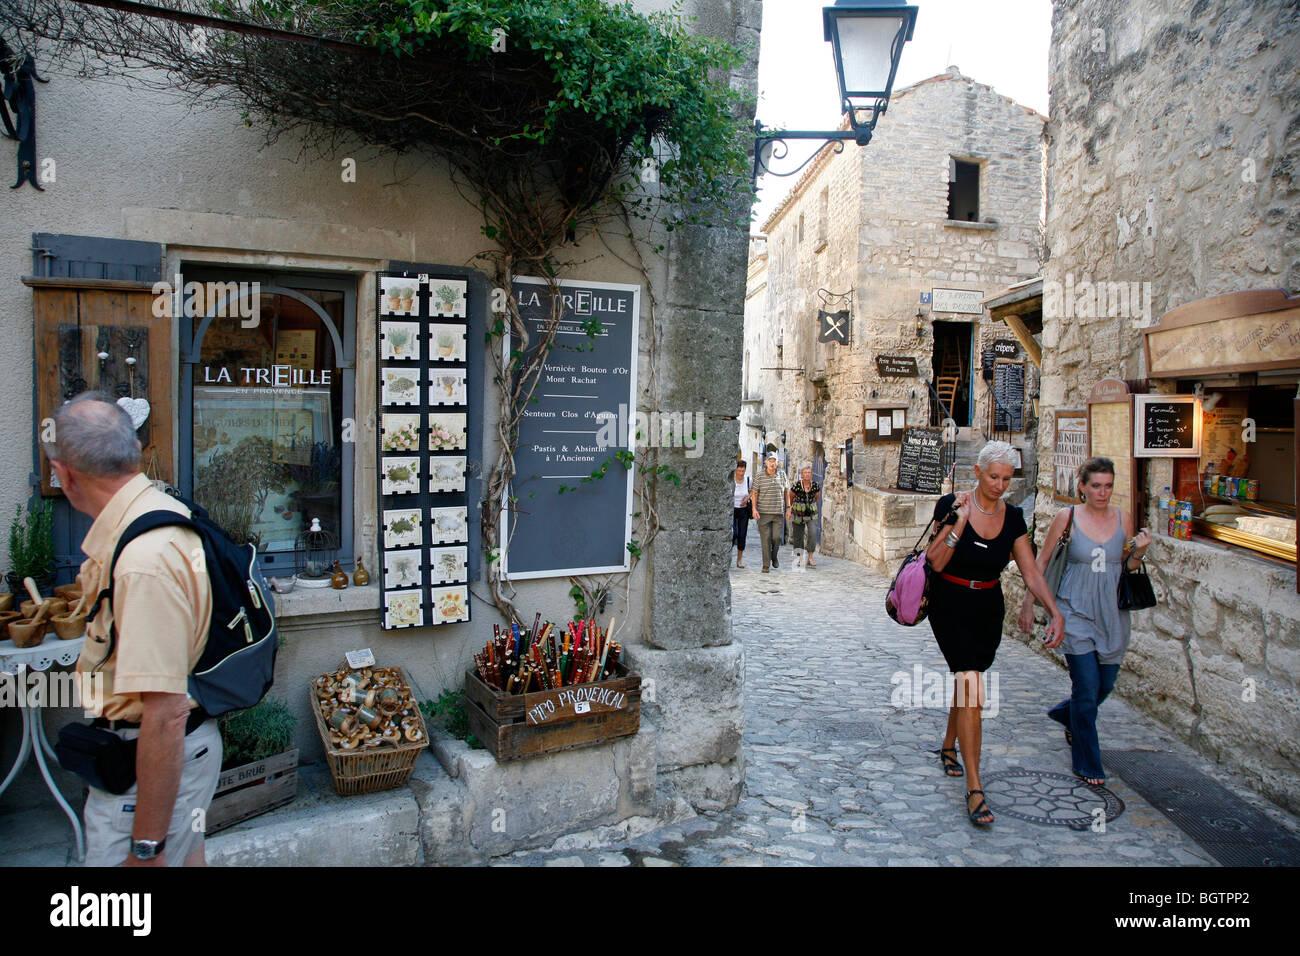 Rue du Trencat, the main street in Les Baux de Provence, Bouches-du-Rhone, Provence, France. - Stock Image